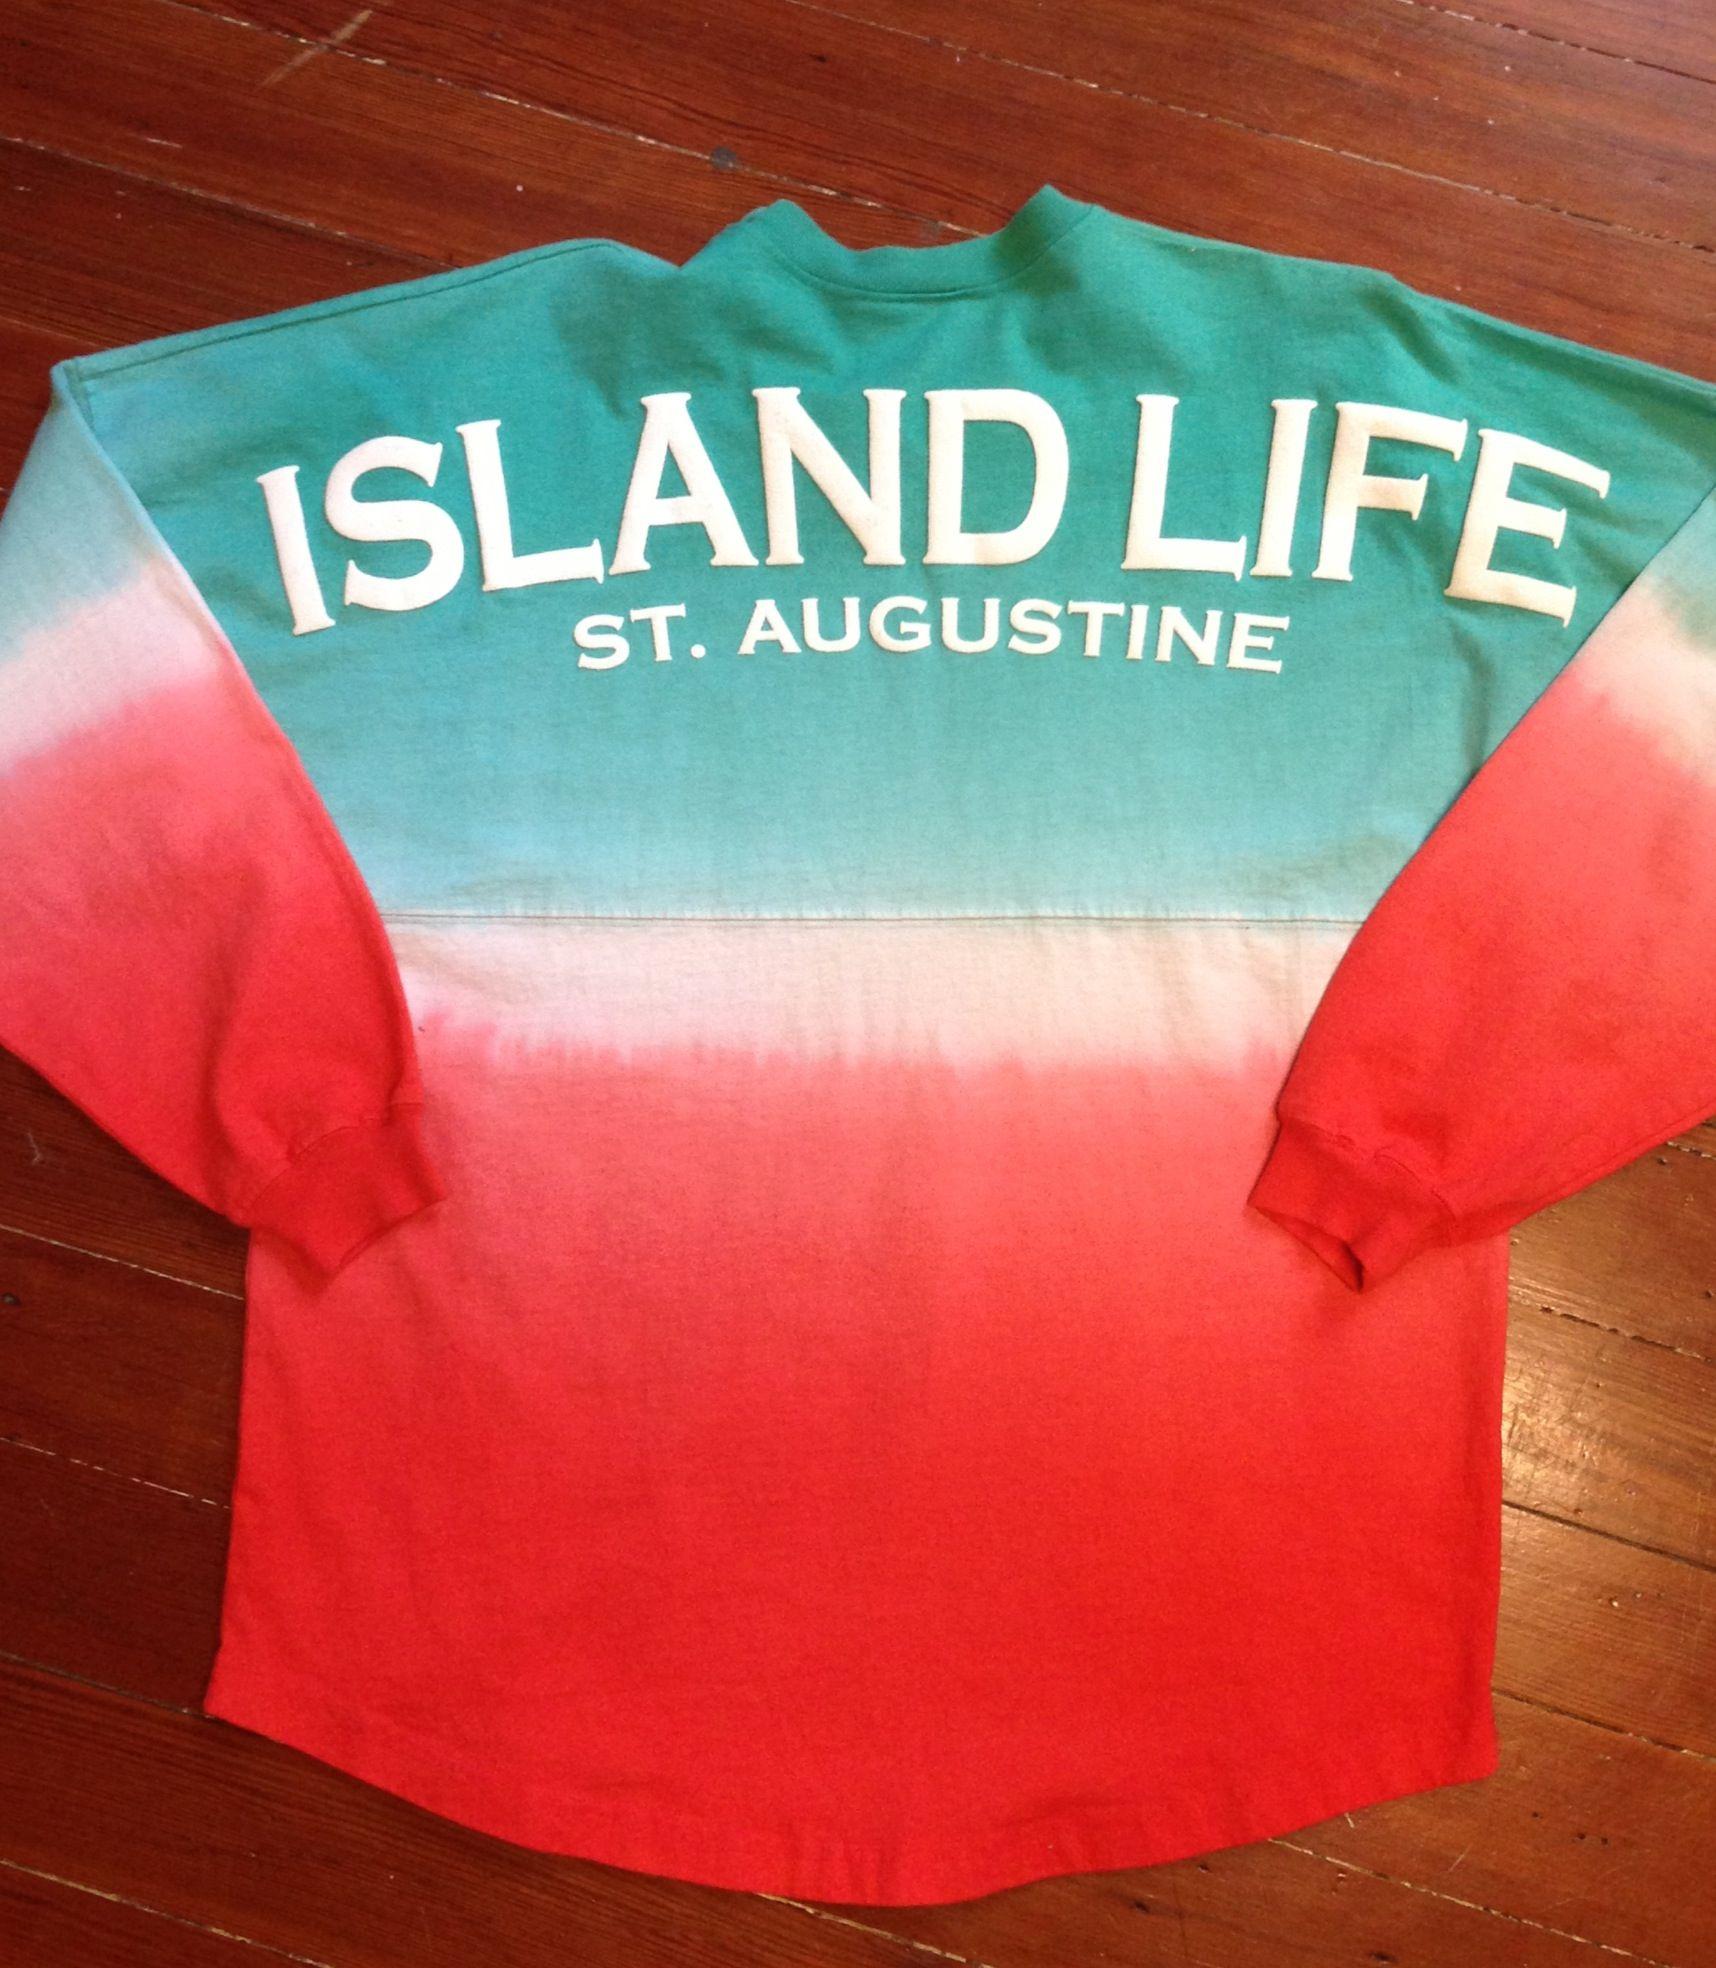 Island life st augustine fl